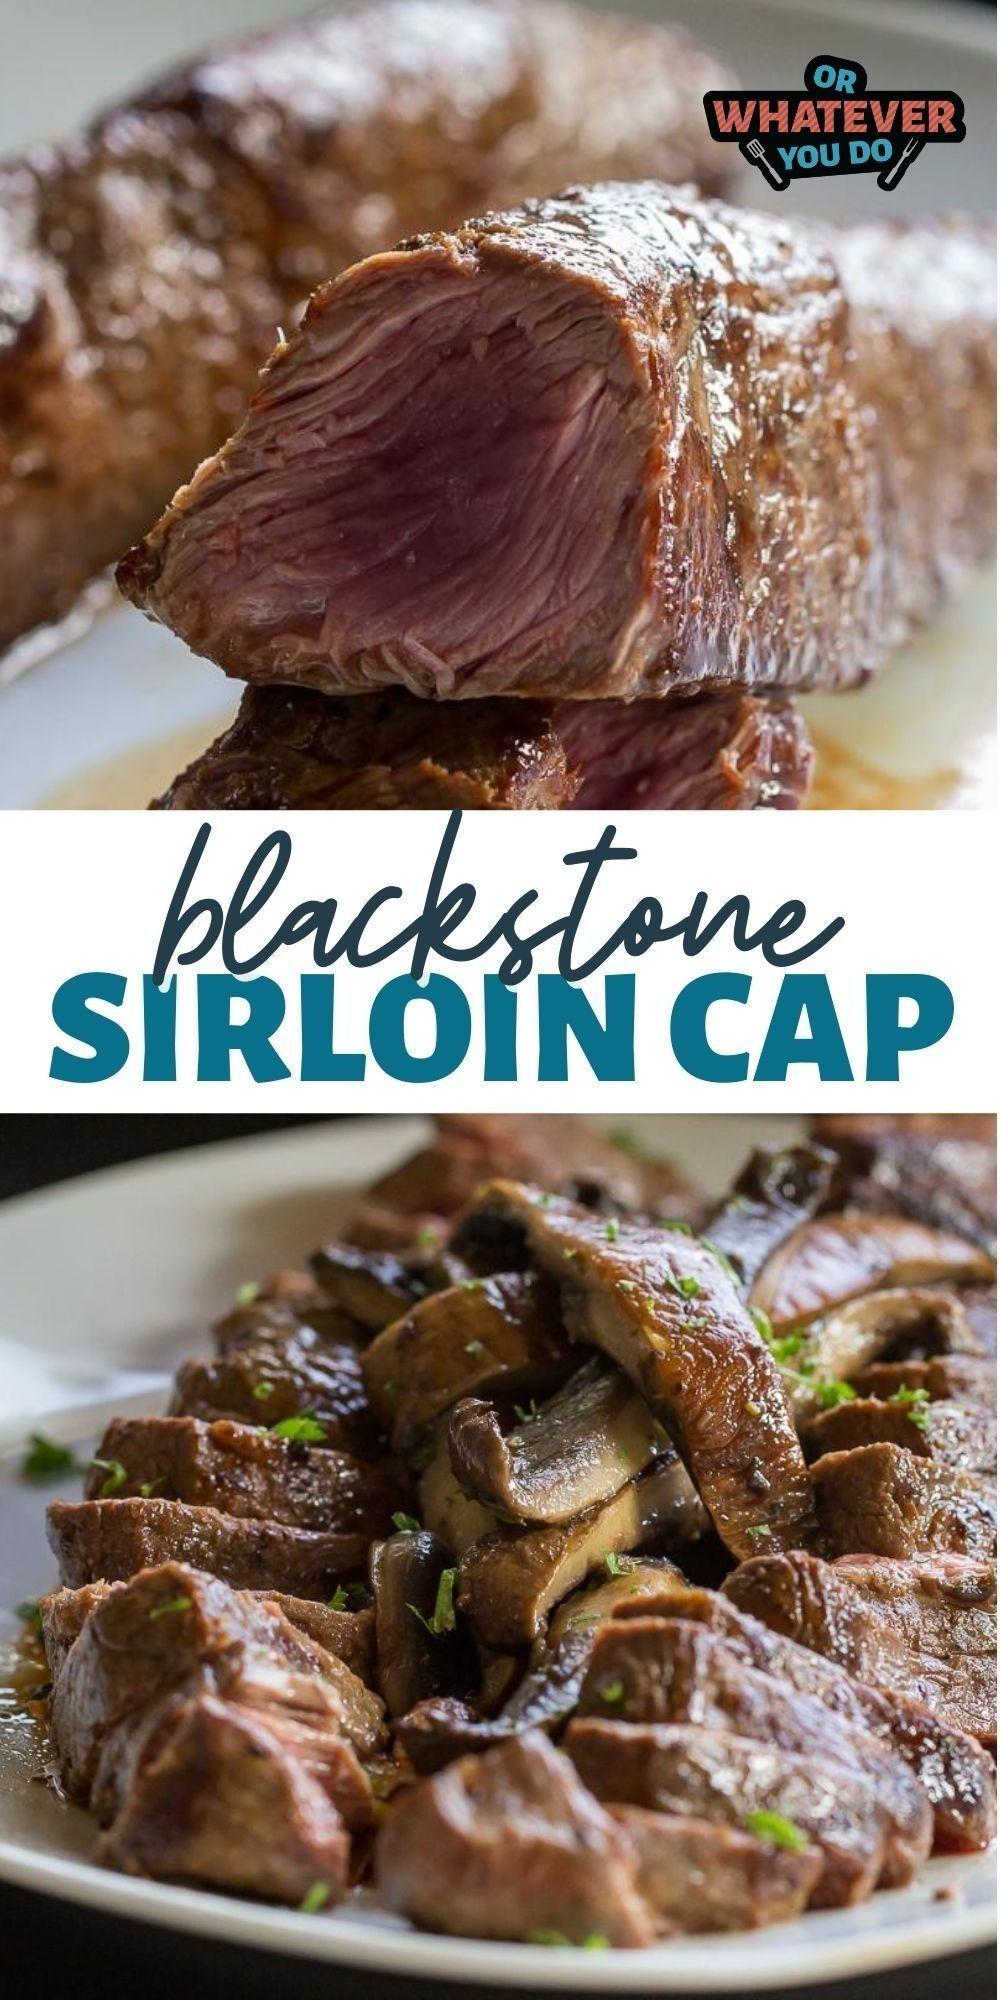 Blackstone sirloin cap steak recipe or whatever you do